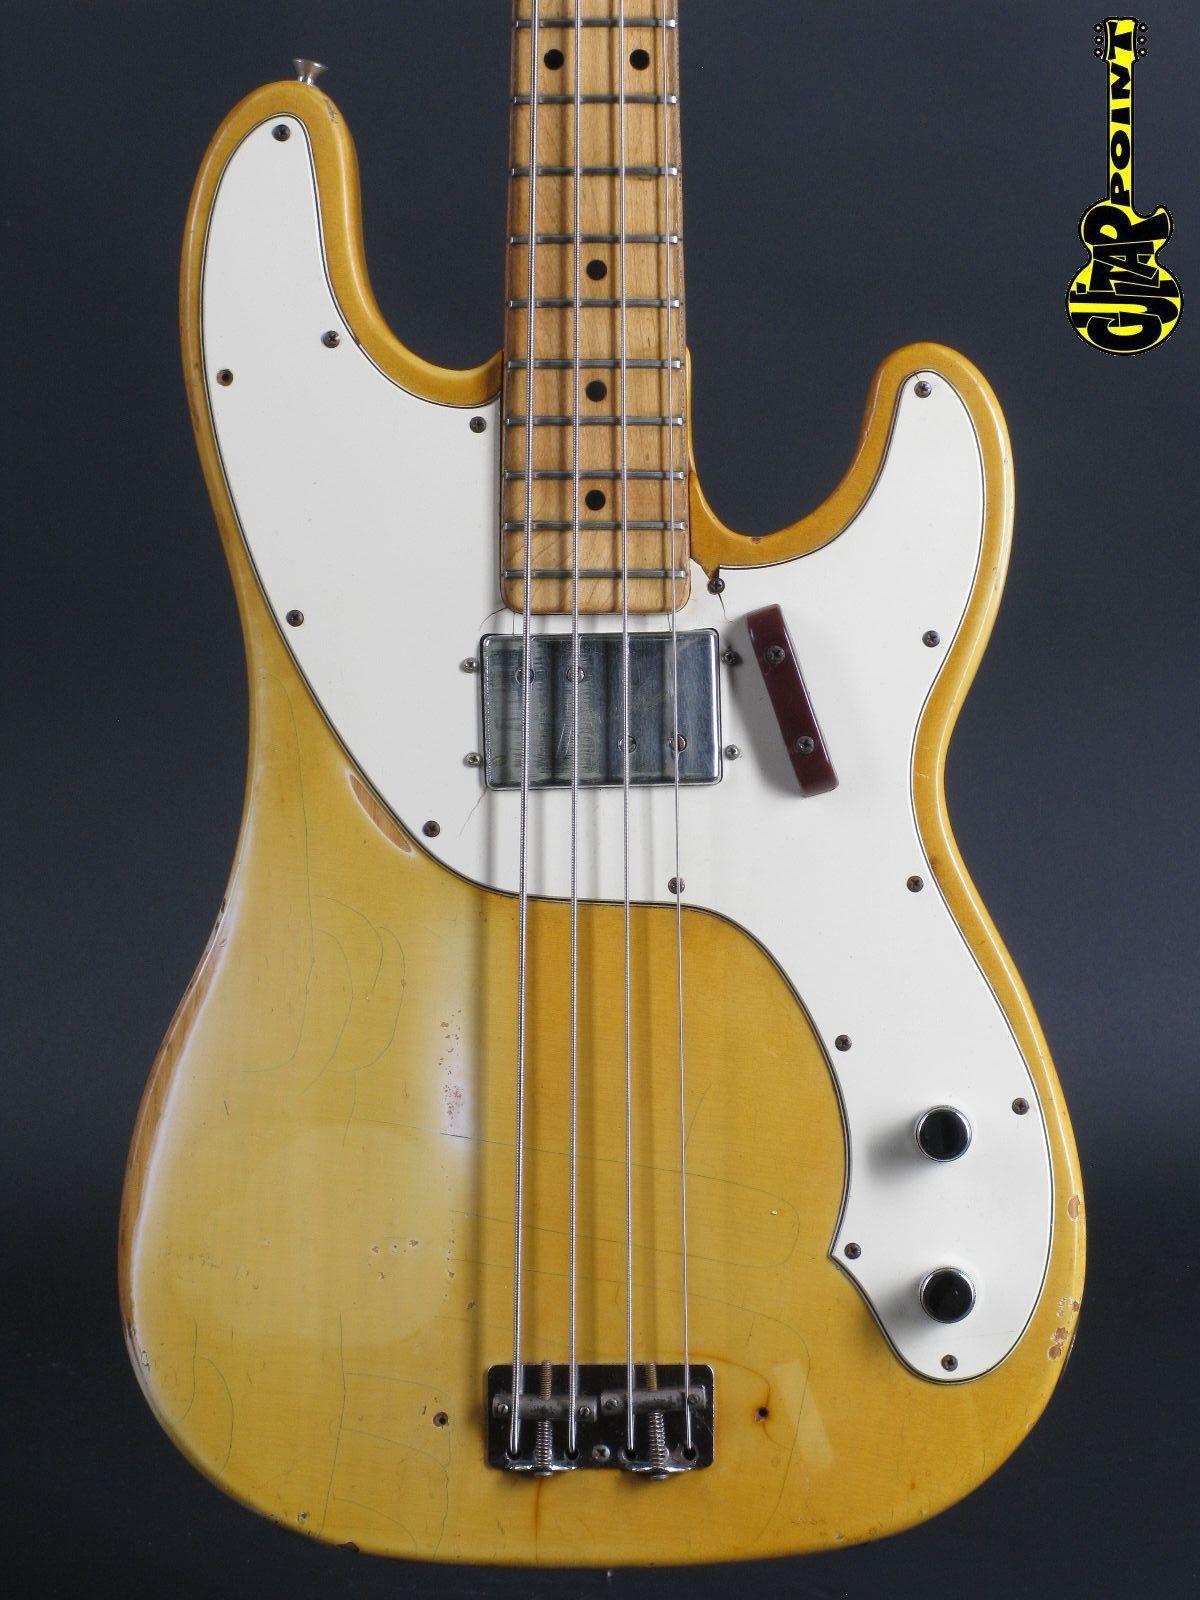 1973 Fender Telecaster Bass - Blond